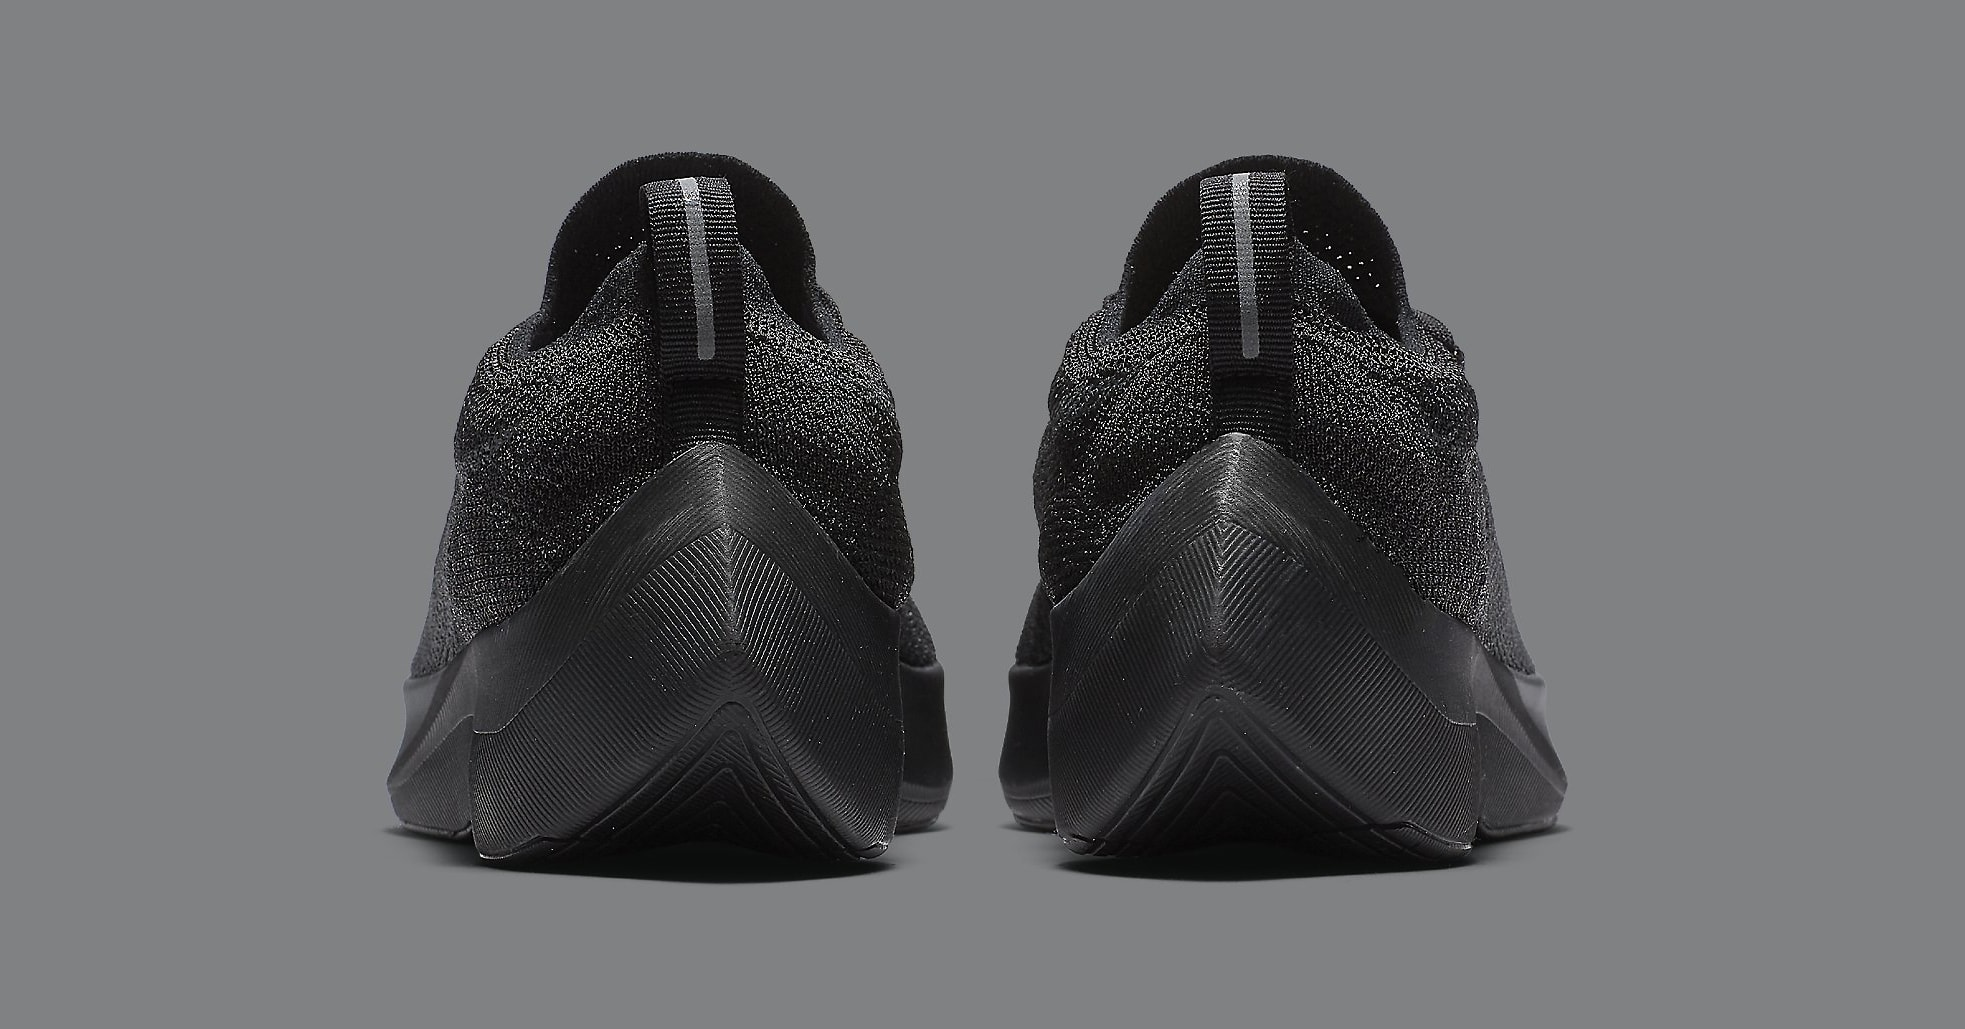 Nike Vapor Street Flyknit 'Black' AQ1763-001 (Heel)